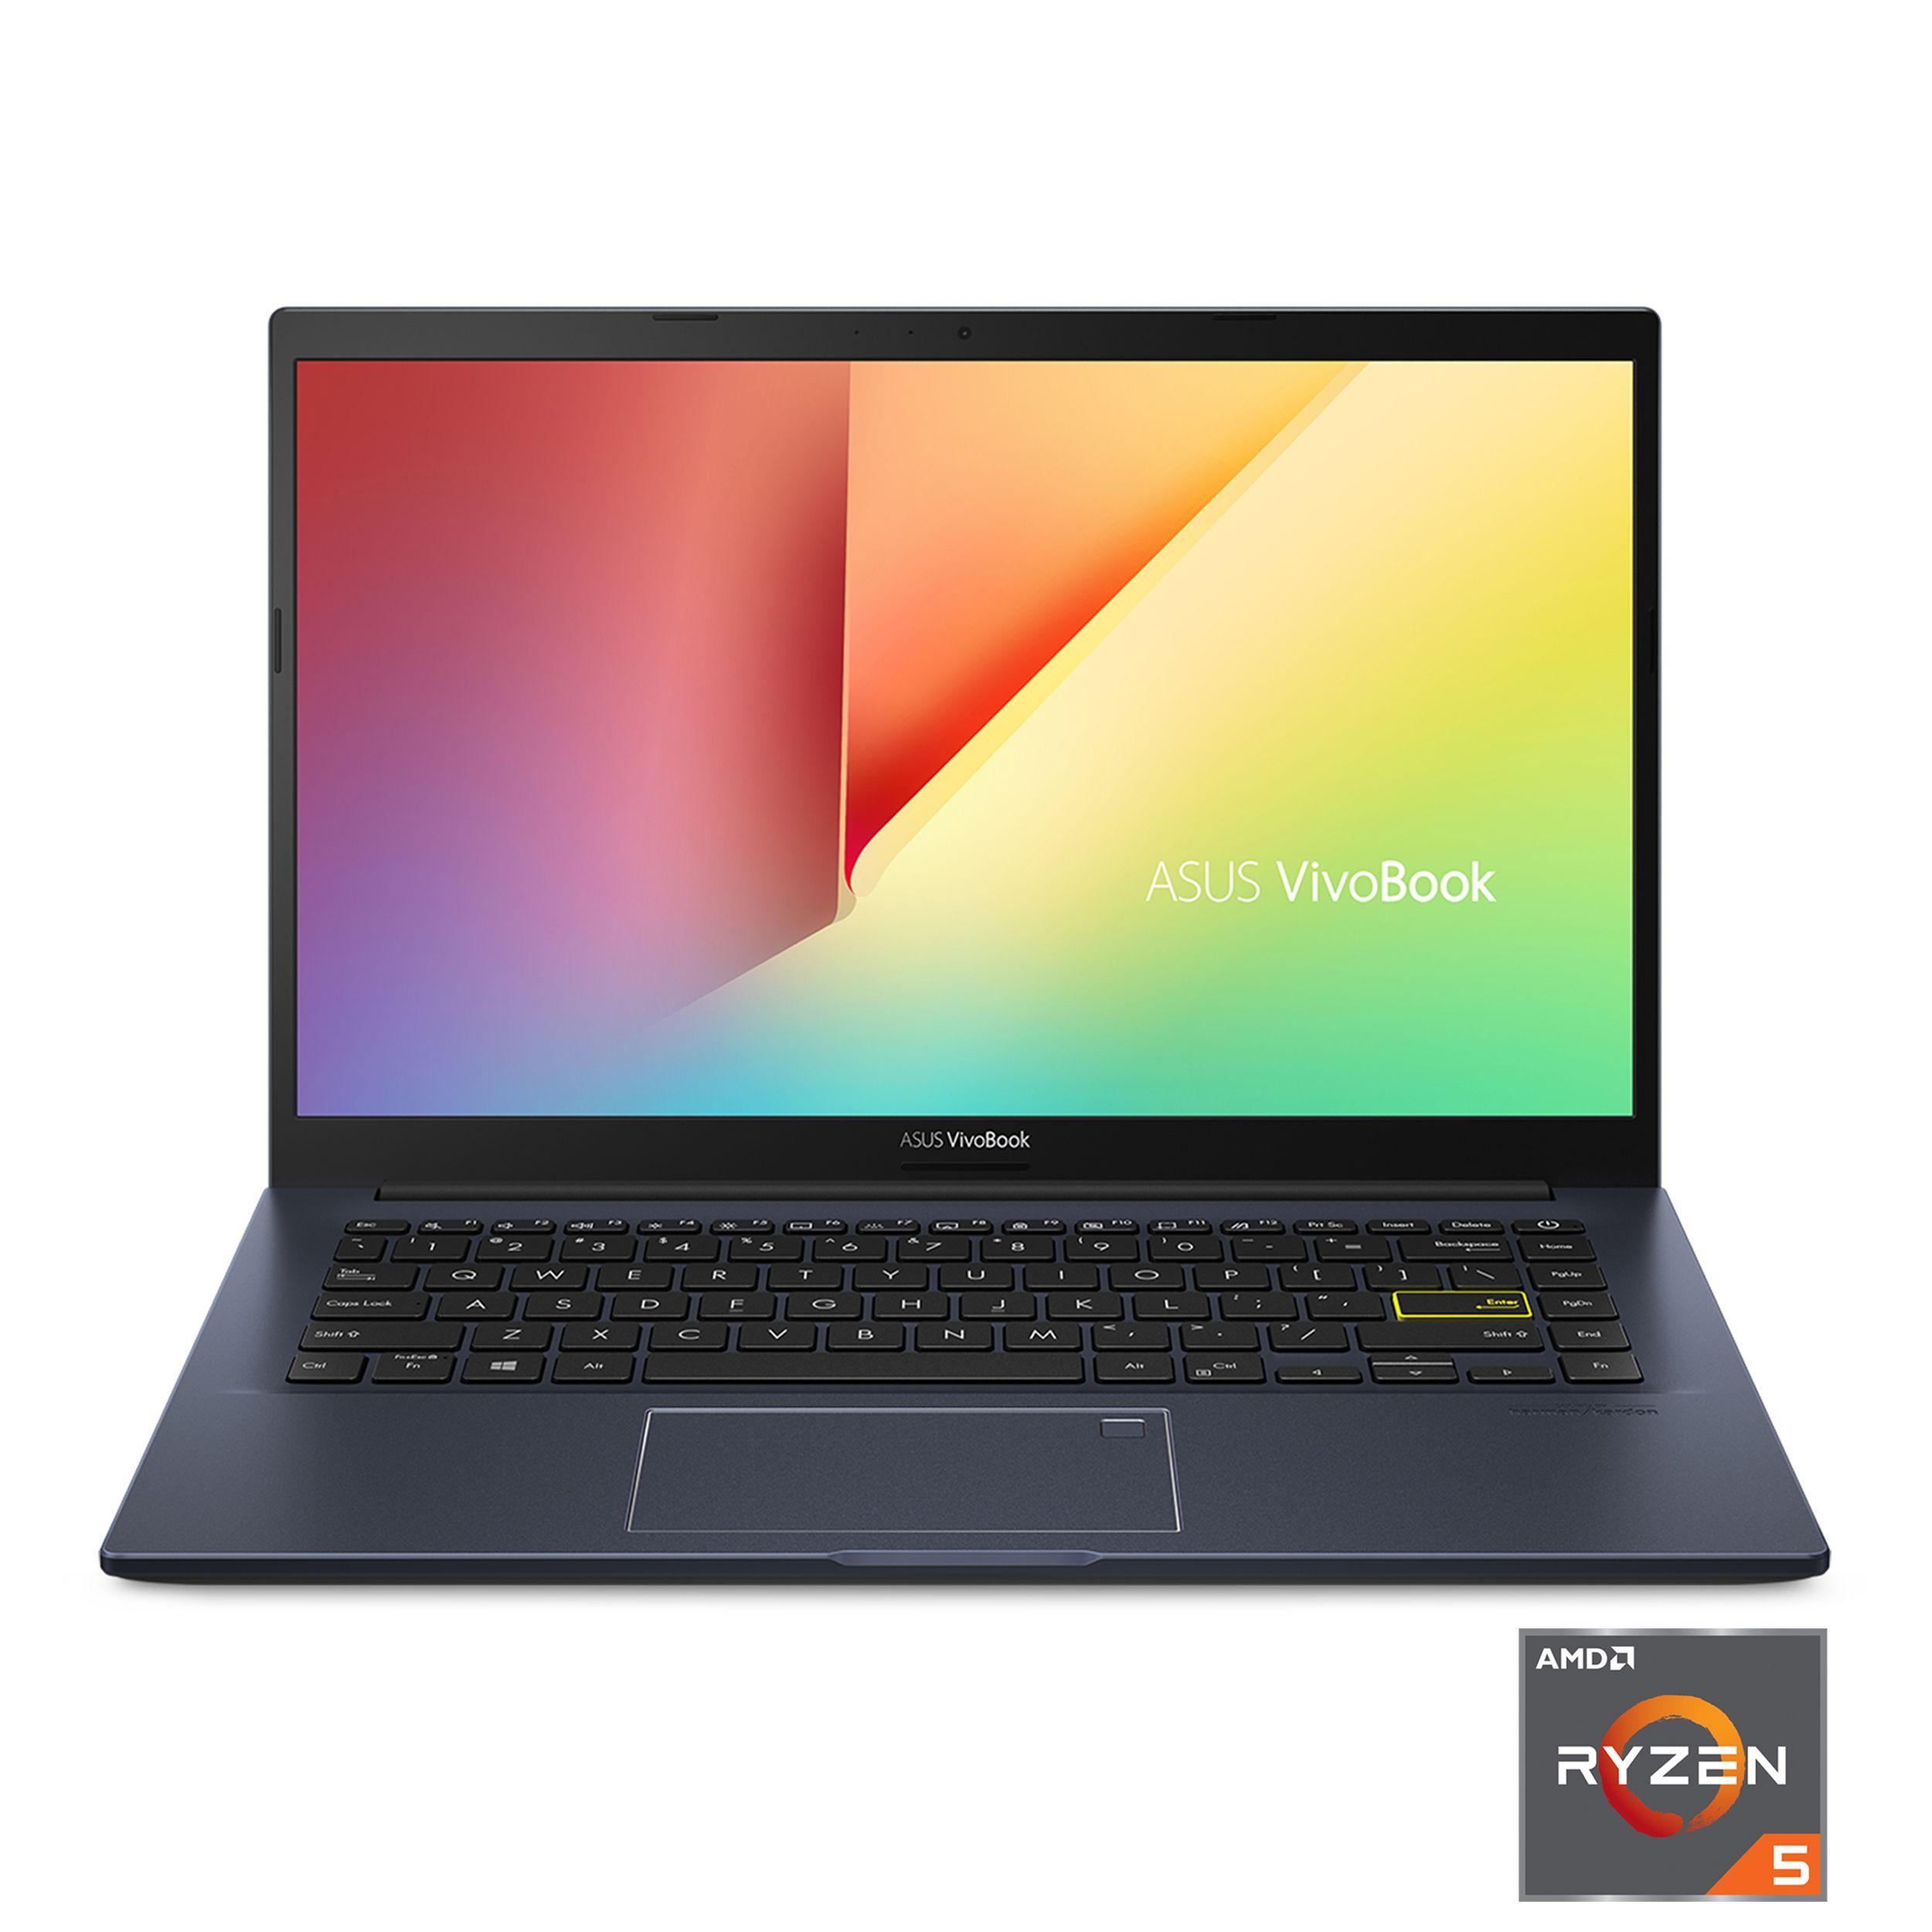 Asus Vivobook 14 M413 Thin And Light Laptop 14 Fhd Amd Ryzen 5 3500u Cpu 8gb Ddr4 Ram 256gb Pcie Ssd Windows 10 Home M413da Ws51 Bespoke Black Walmart In 2021 Asus Light Laptops Laptop